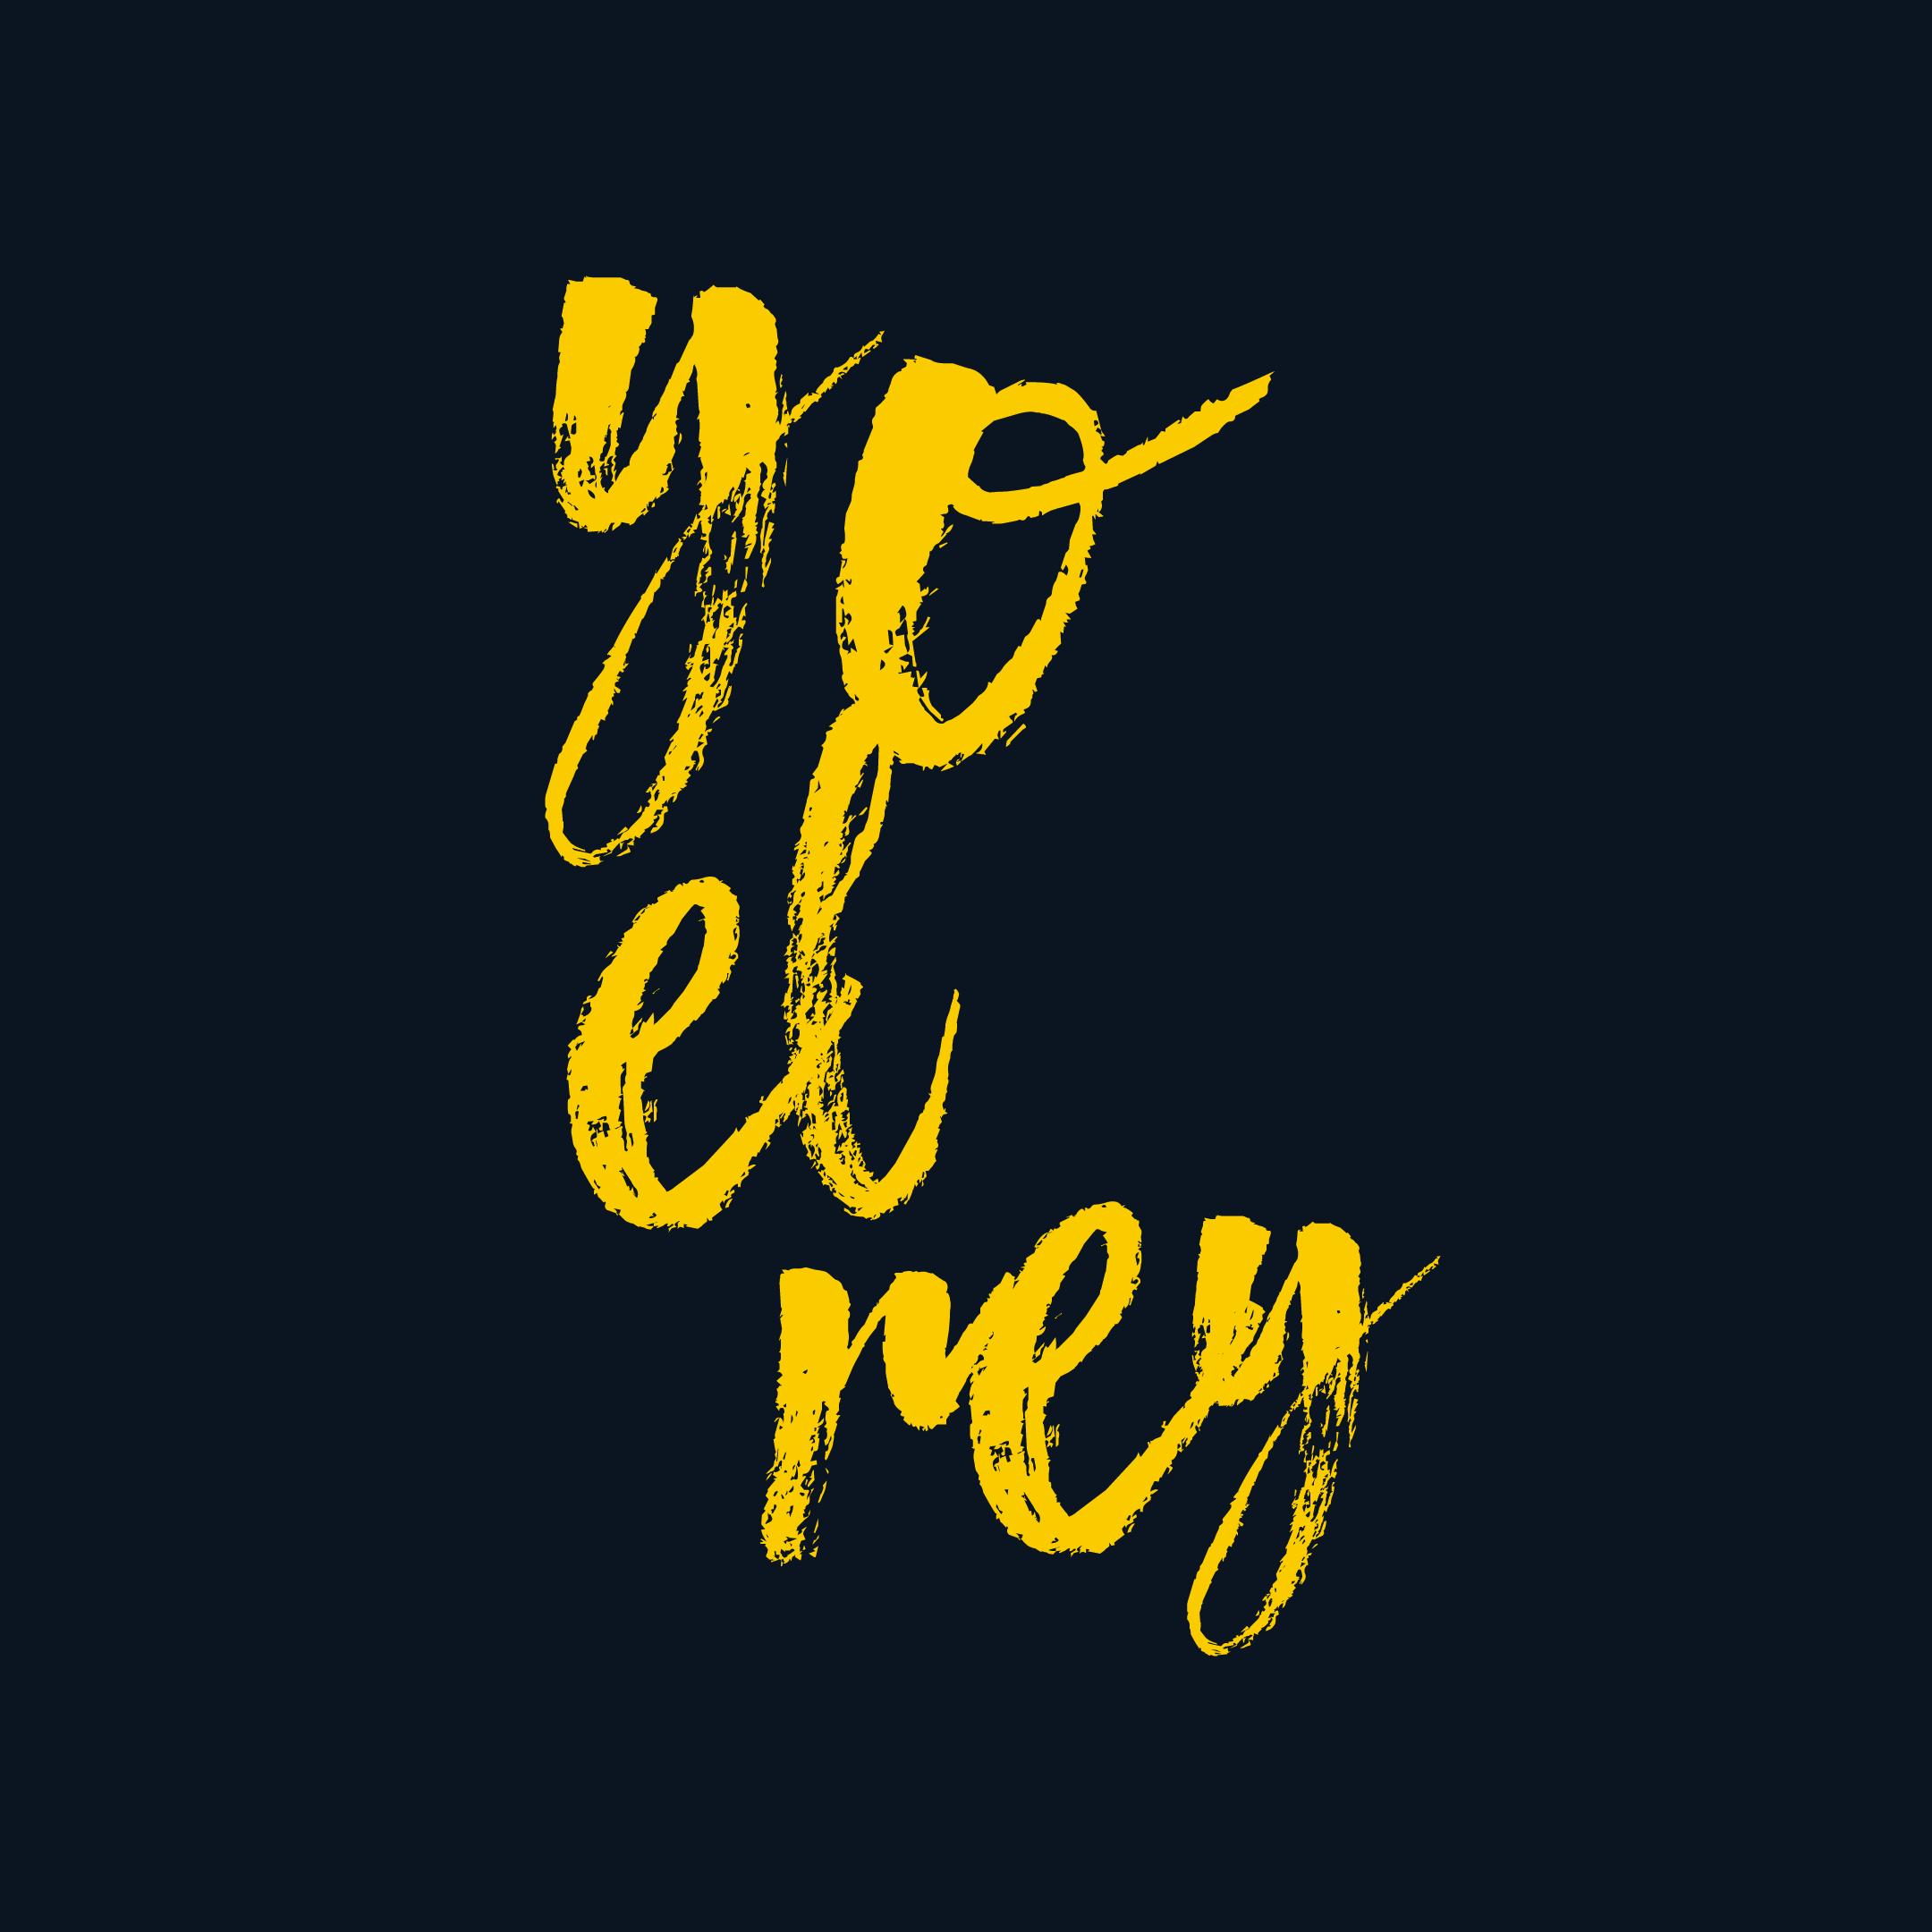 Yo-El-Rey-Web-Resave.png